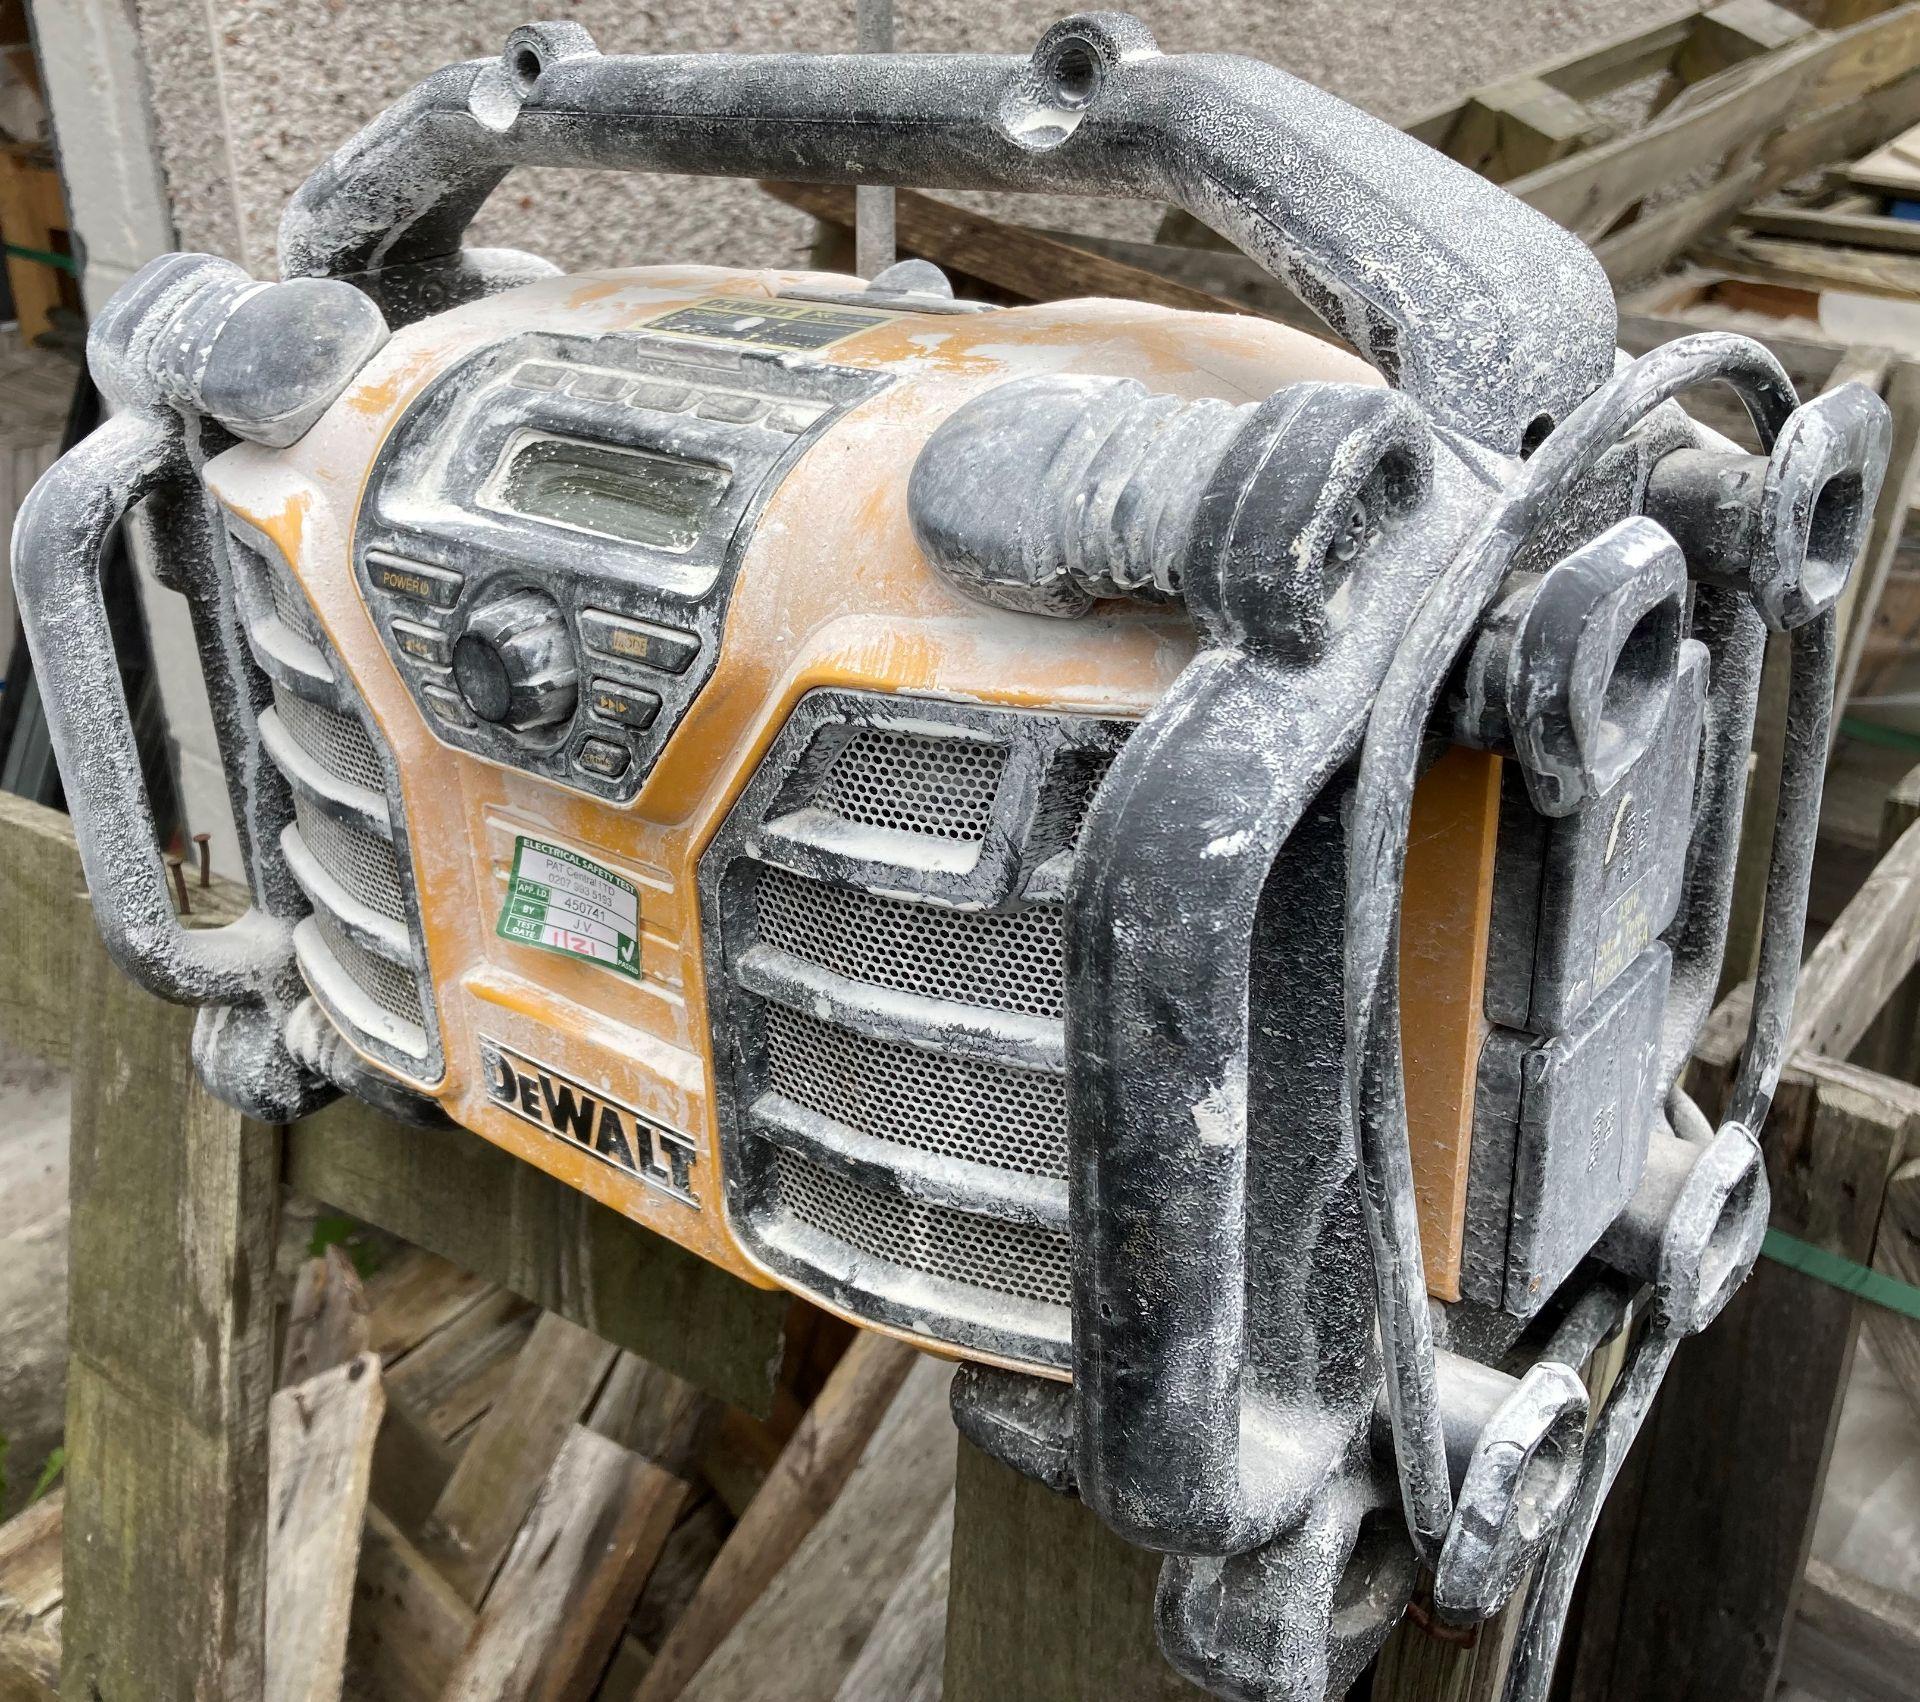 DeWalt DCR017 portable work radio - battery and 240v (as seen) - Image 2 of 2